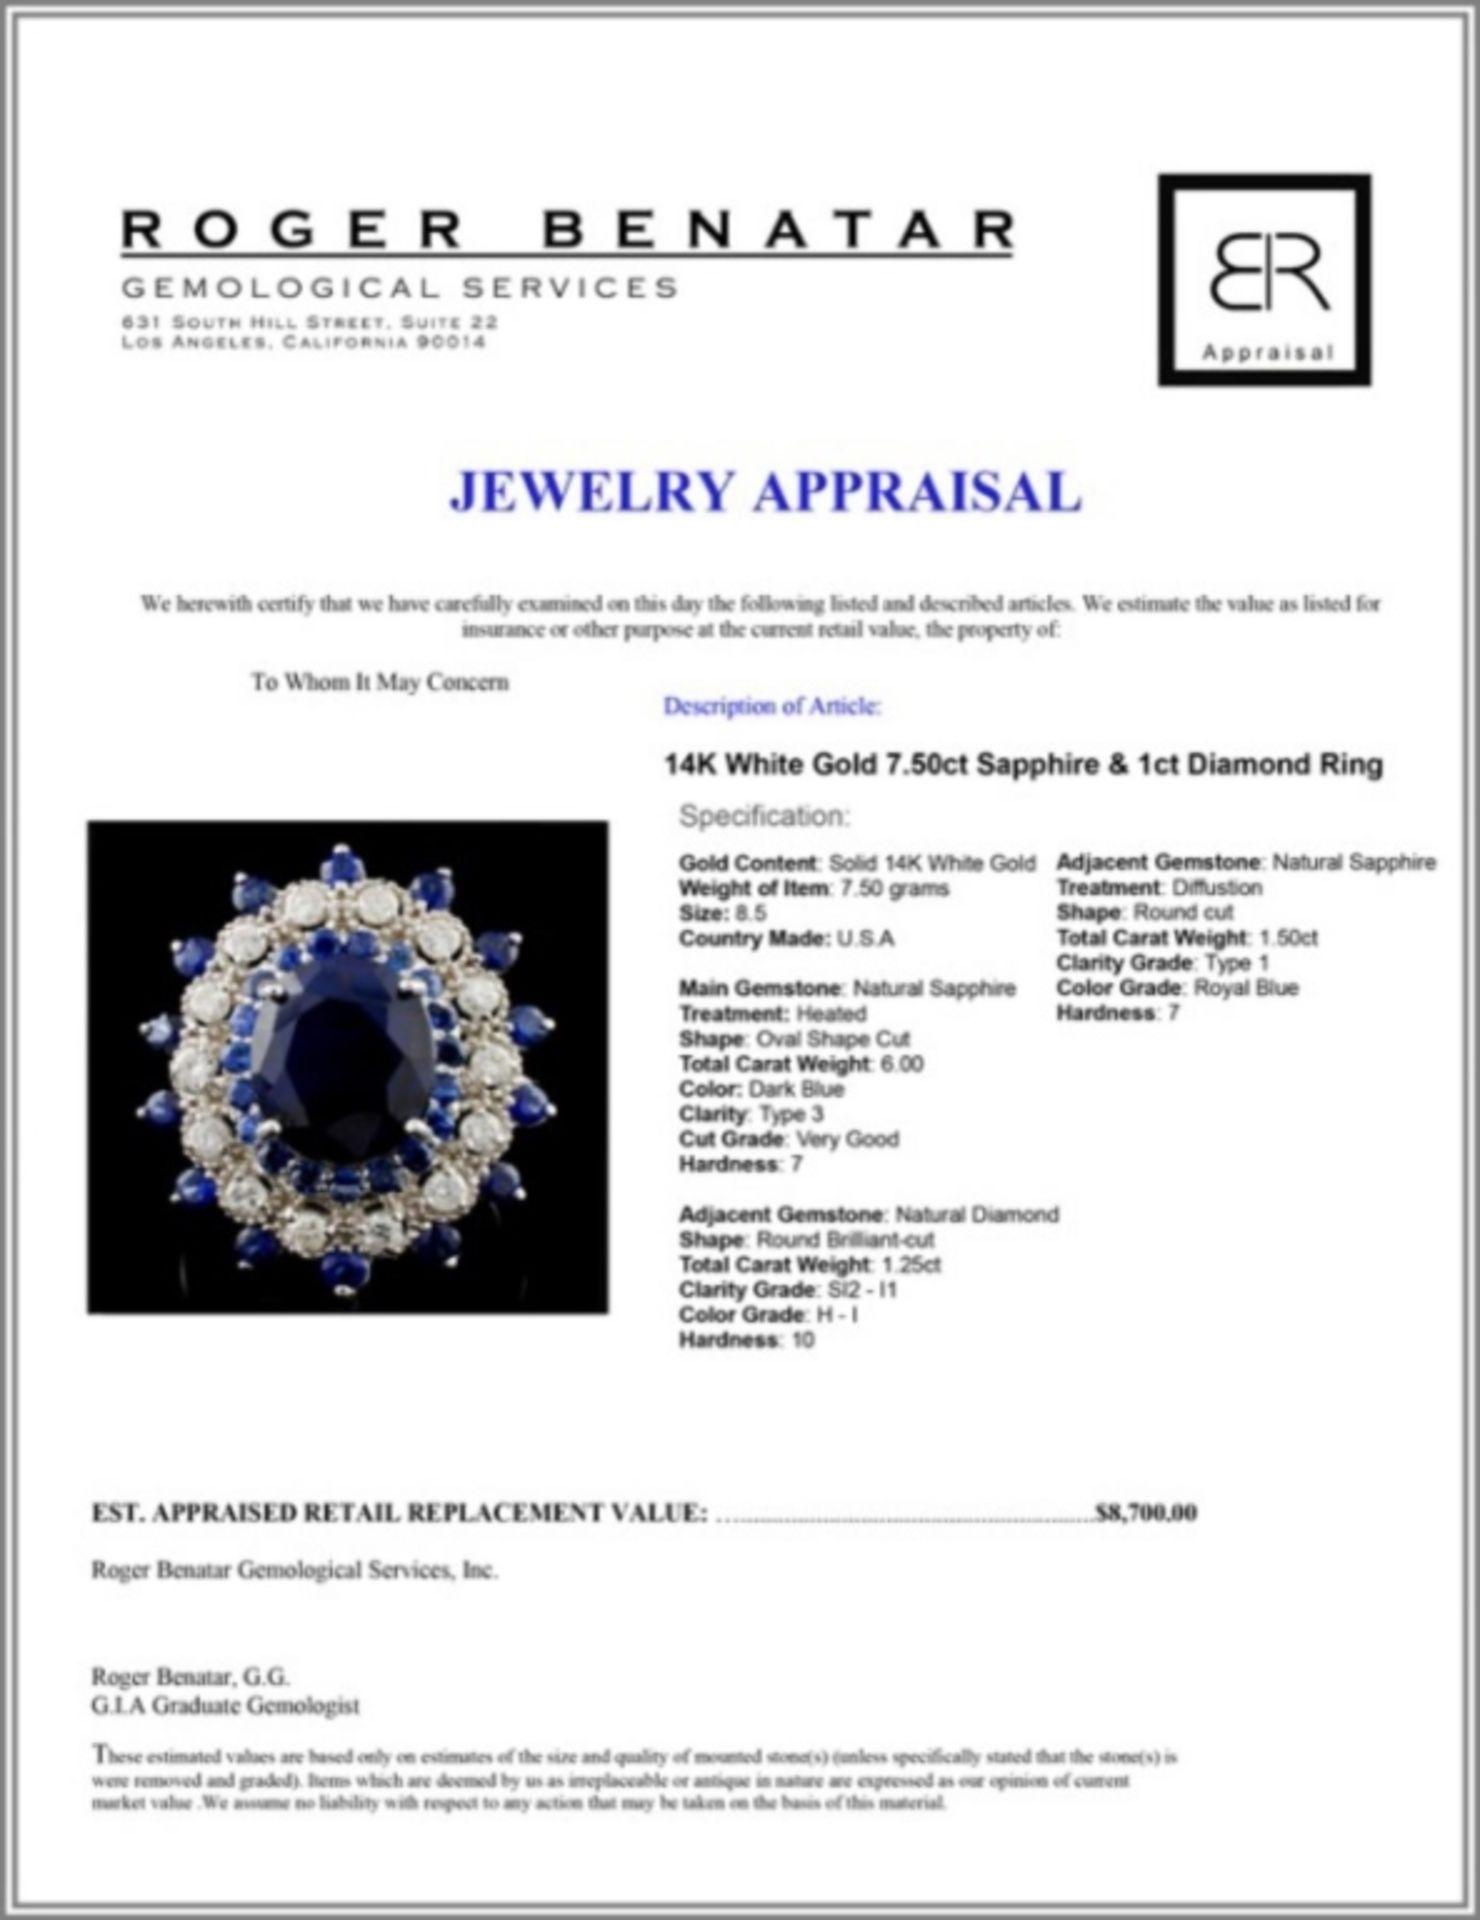 14K White Gold 7.50ct Sapphire & 1ct Diamond Ring - Image 4 of 4